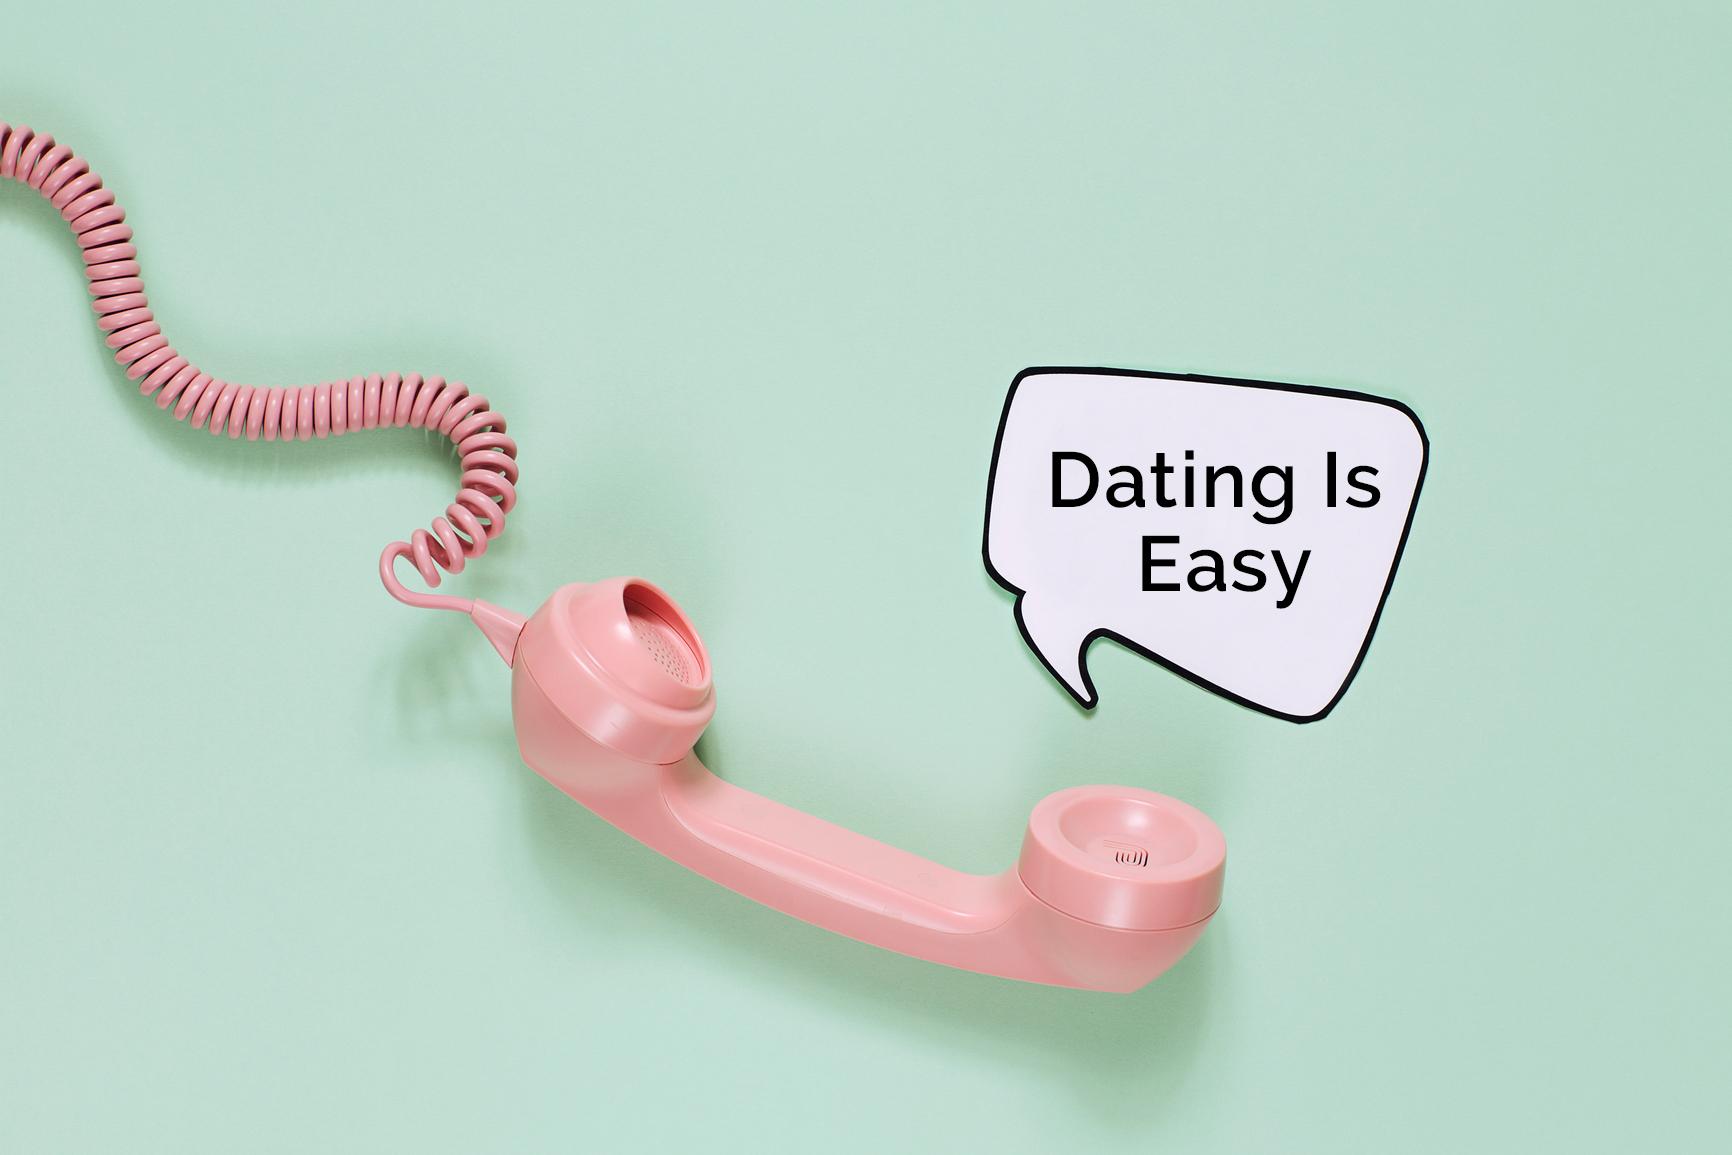 Mylove dating